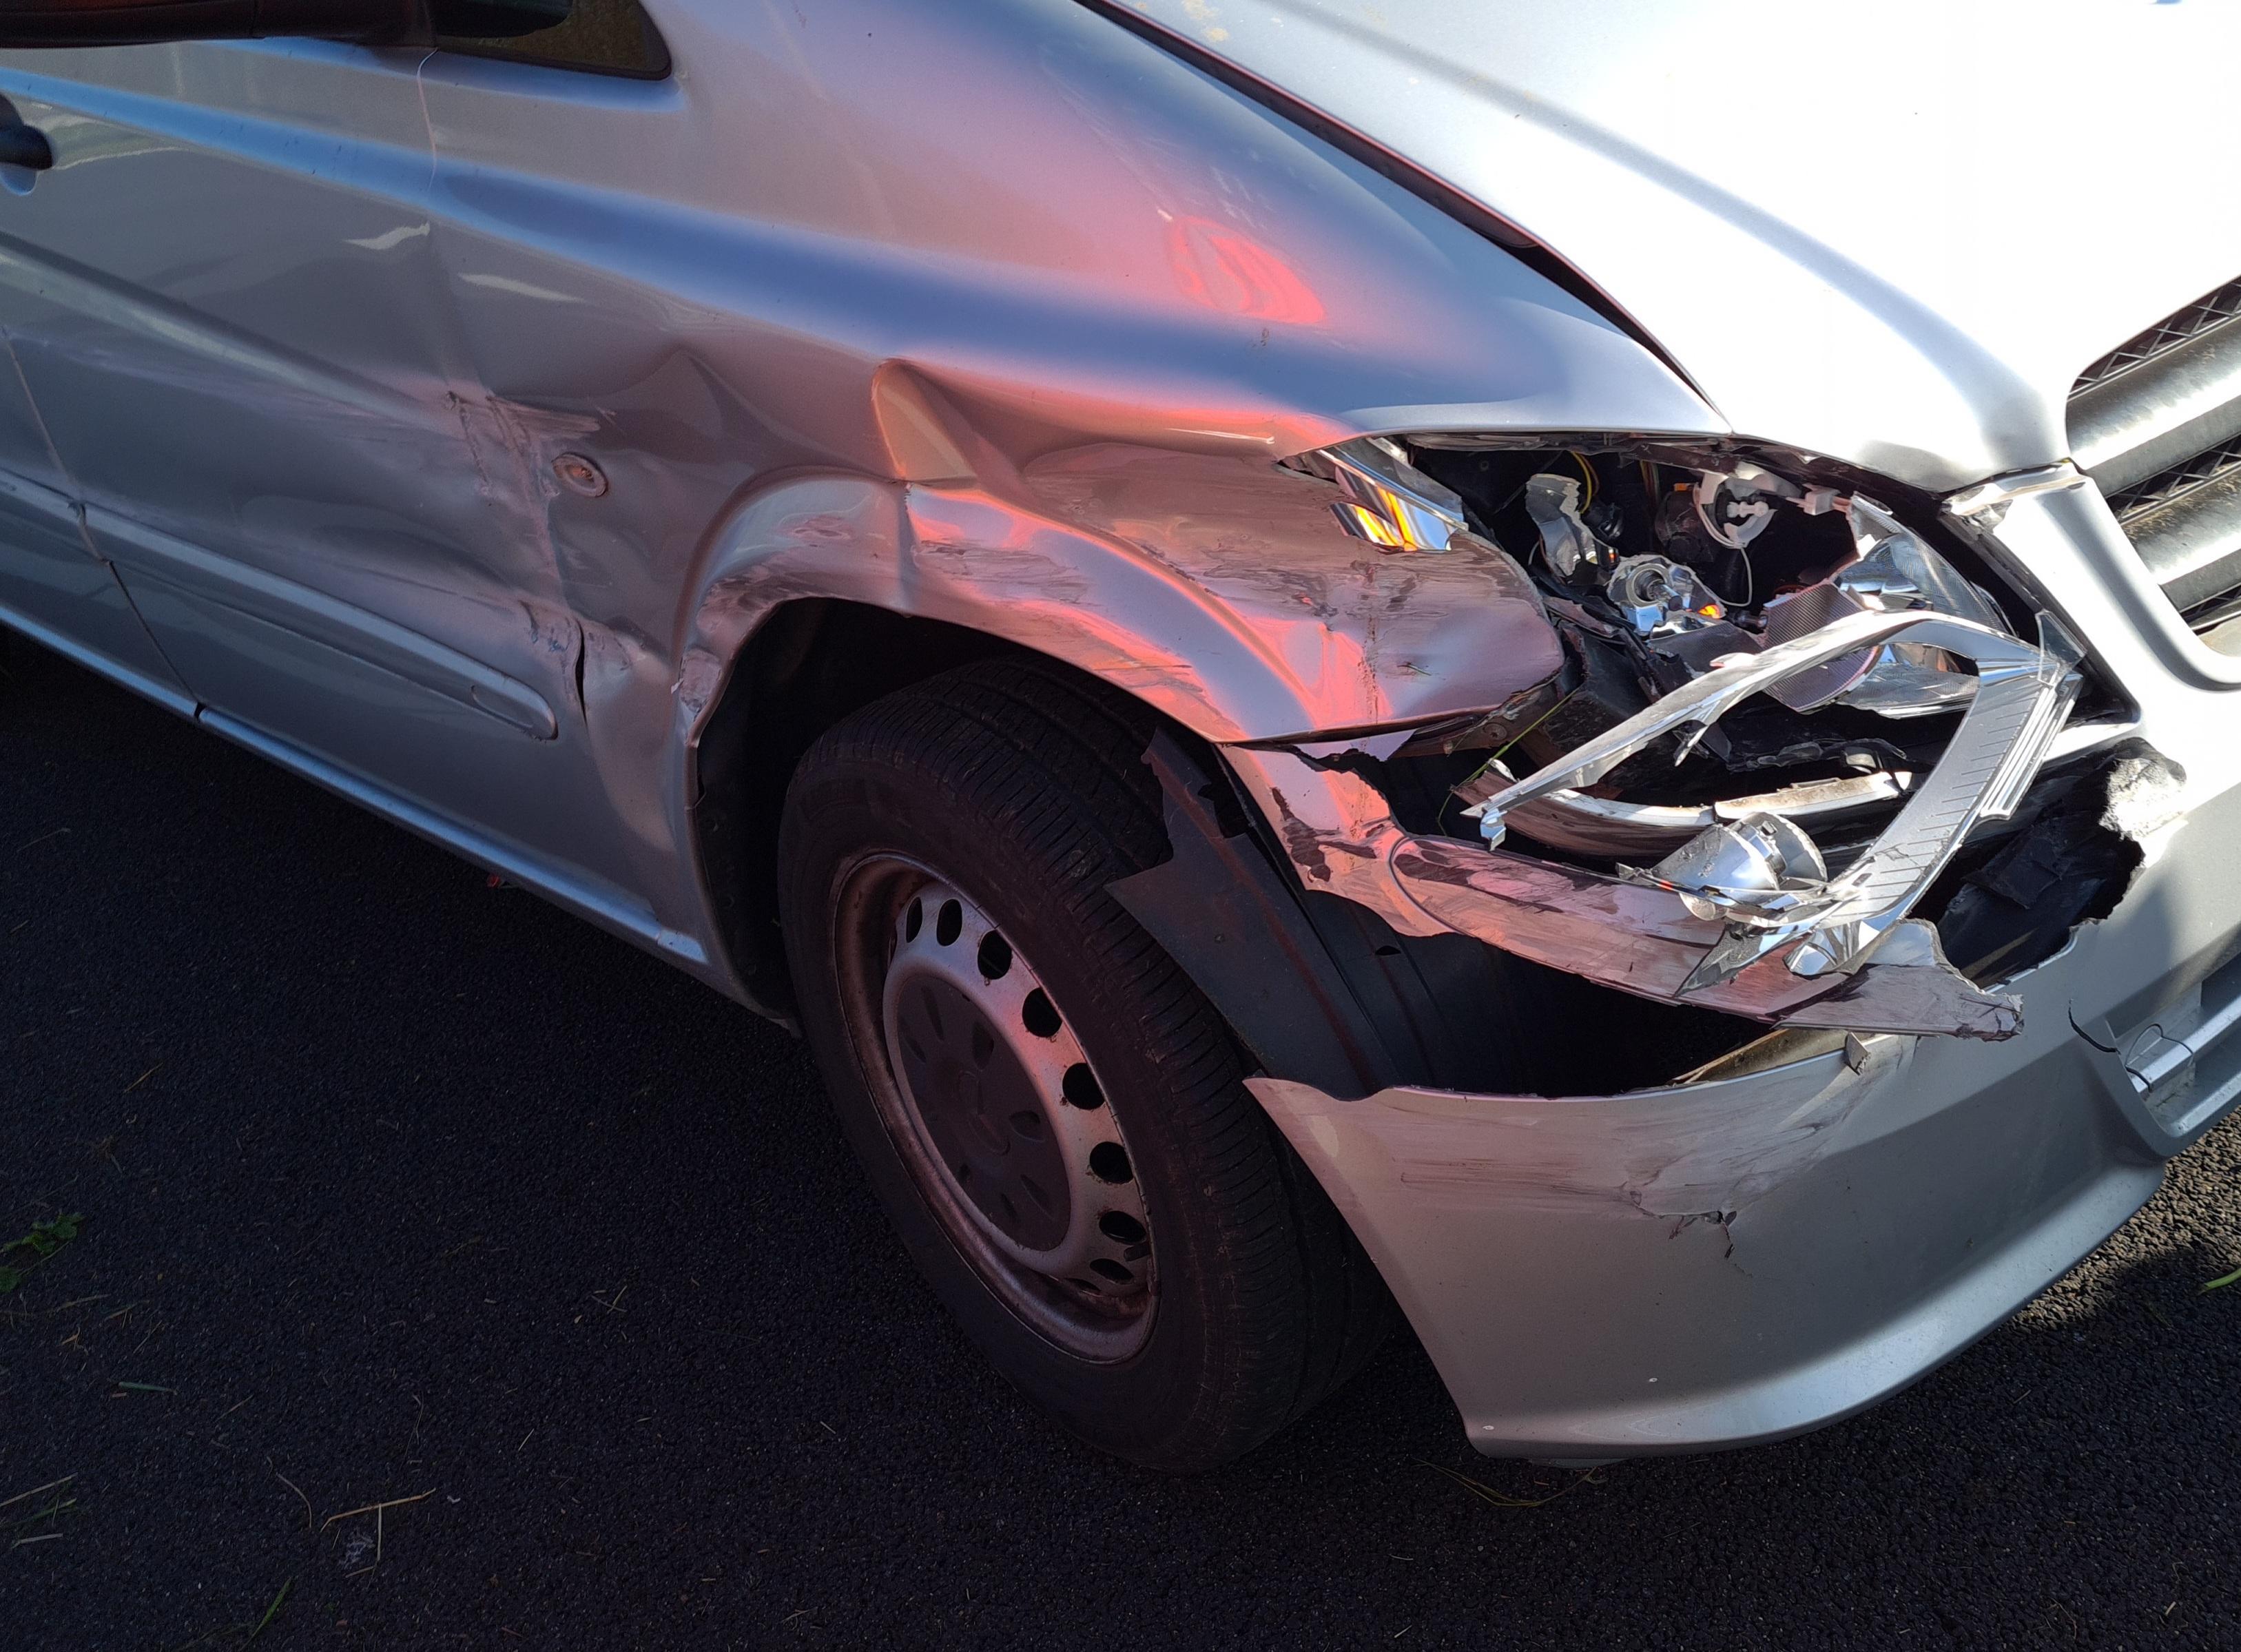 Busje crasht op de A9 bij Velsen-Zuid, bestuurder gewond